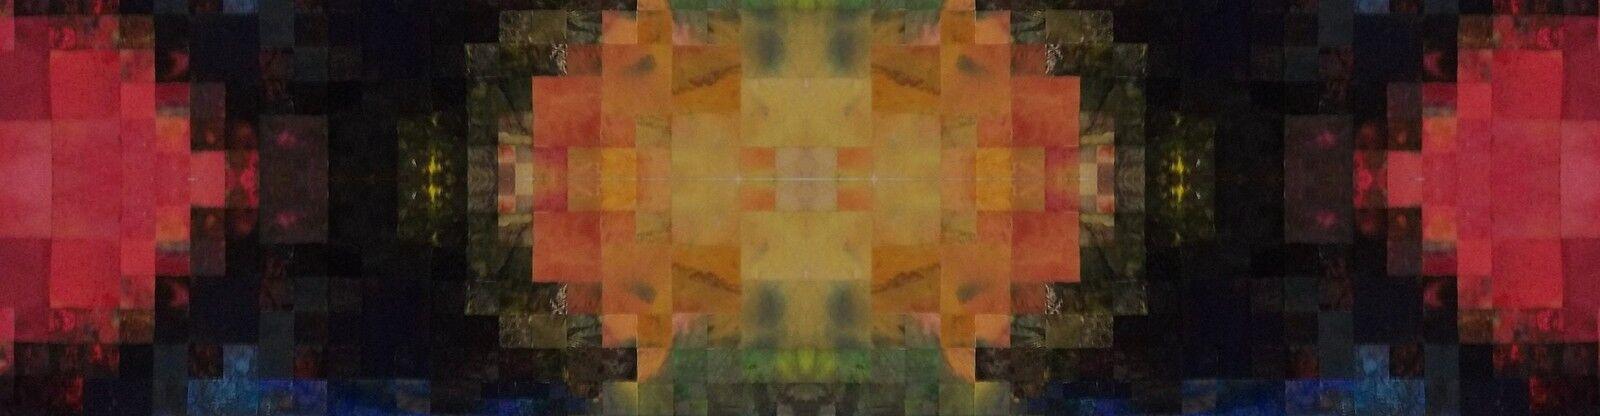 golden_square